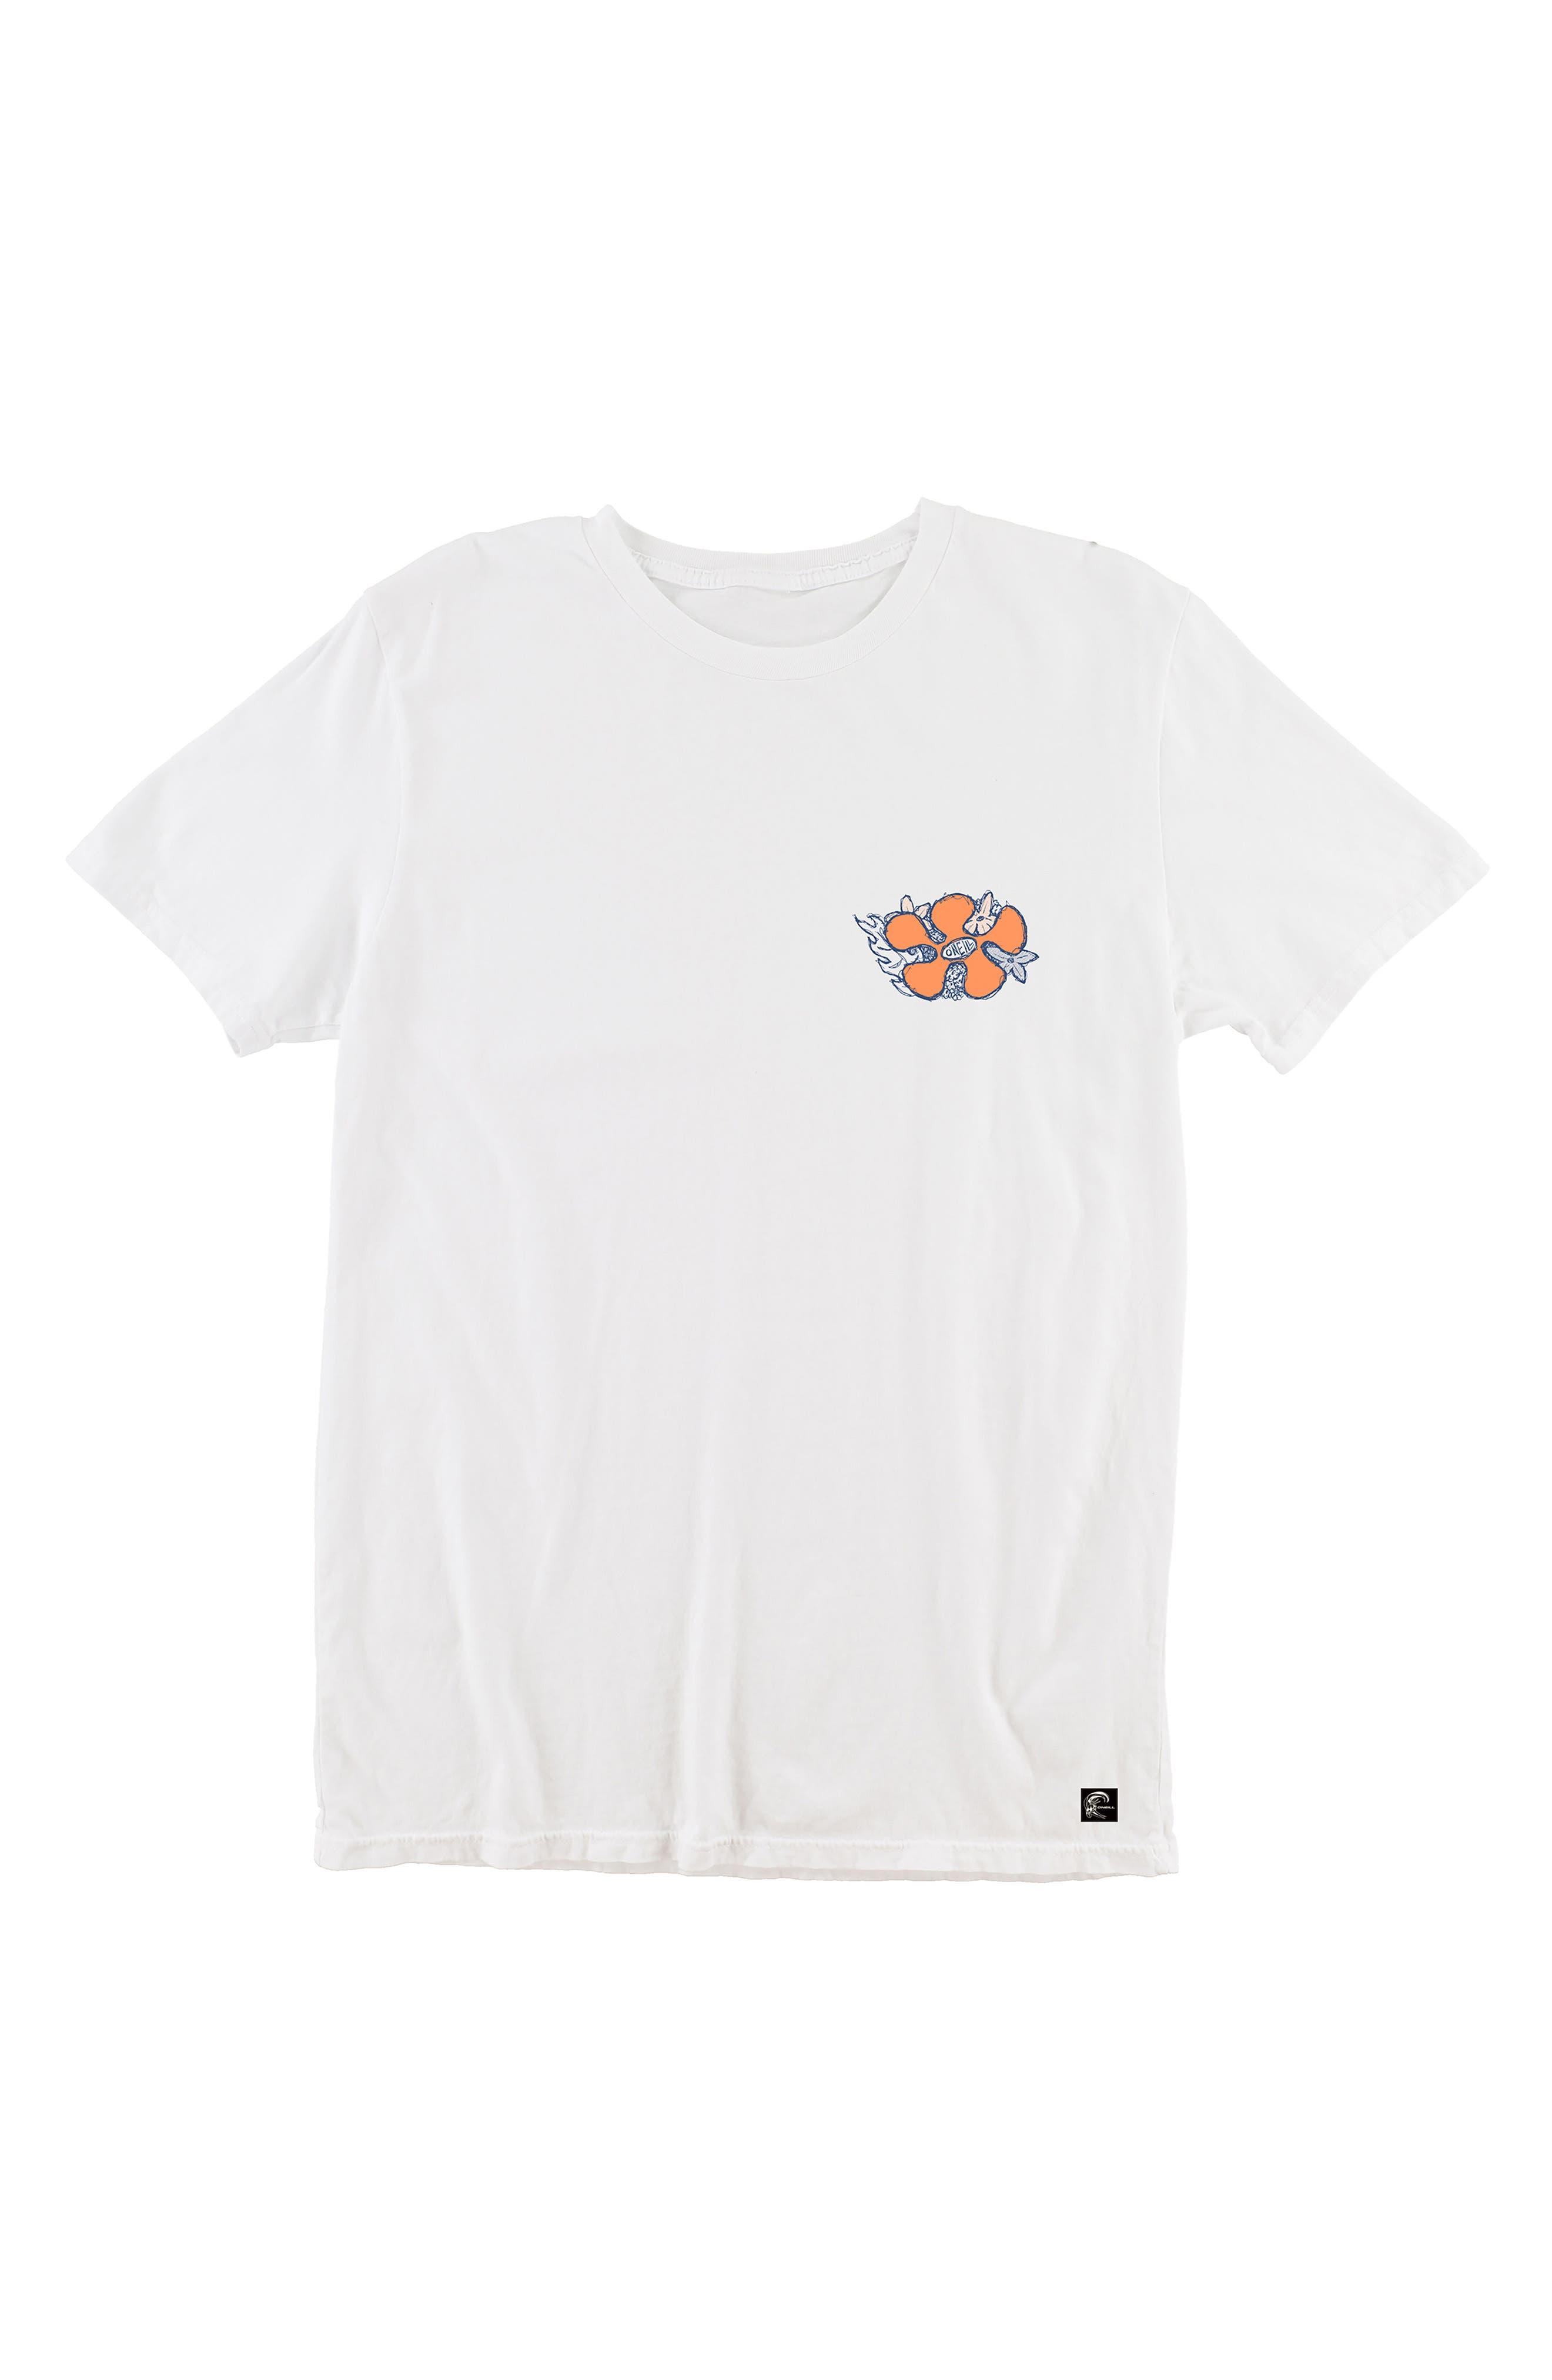 Simich T-Shirt,                             Alternate thumbnail 3, color,                             100